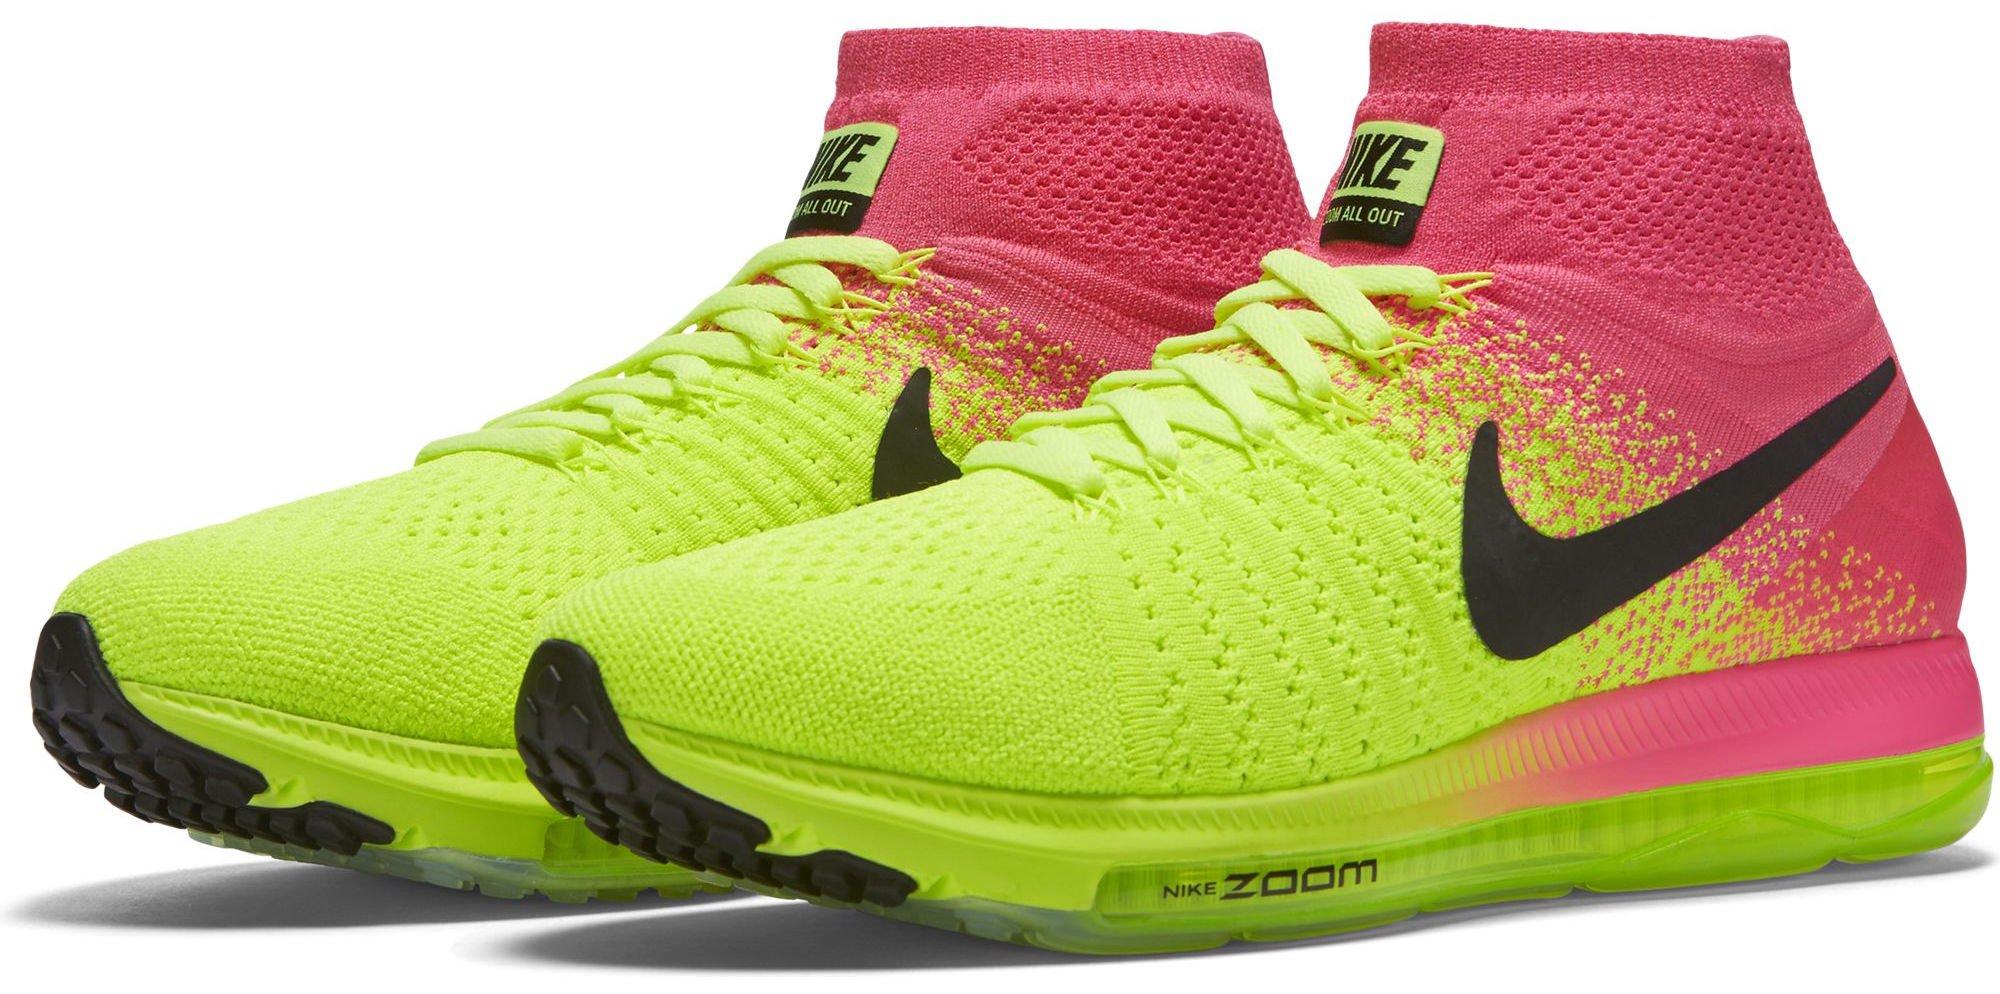 02c2f72873704 Купить женские кроссовки Nike Zoom All Out Flyknit OC W